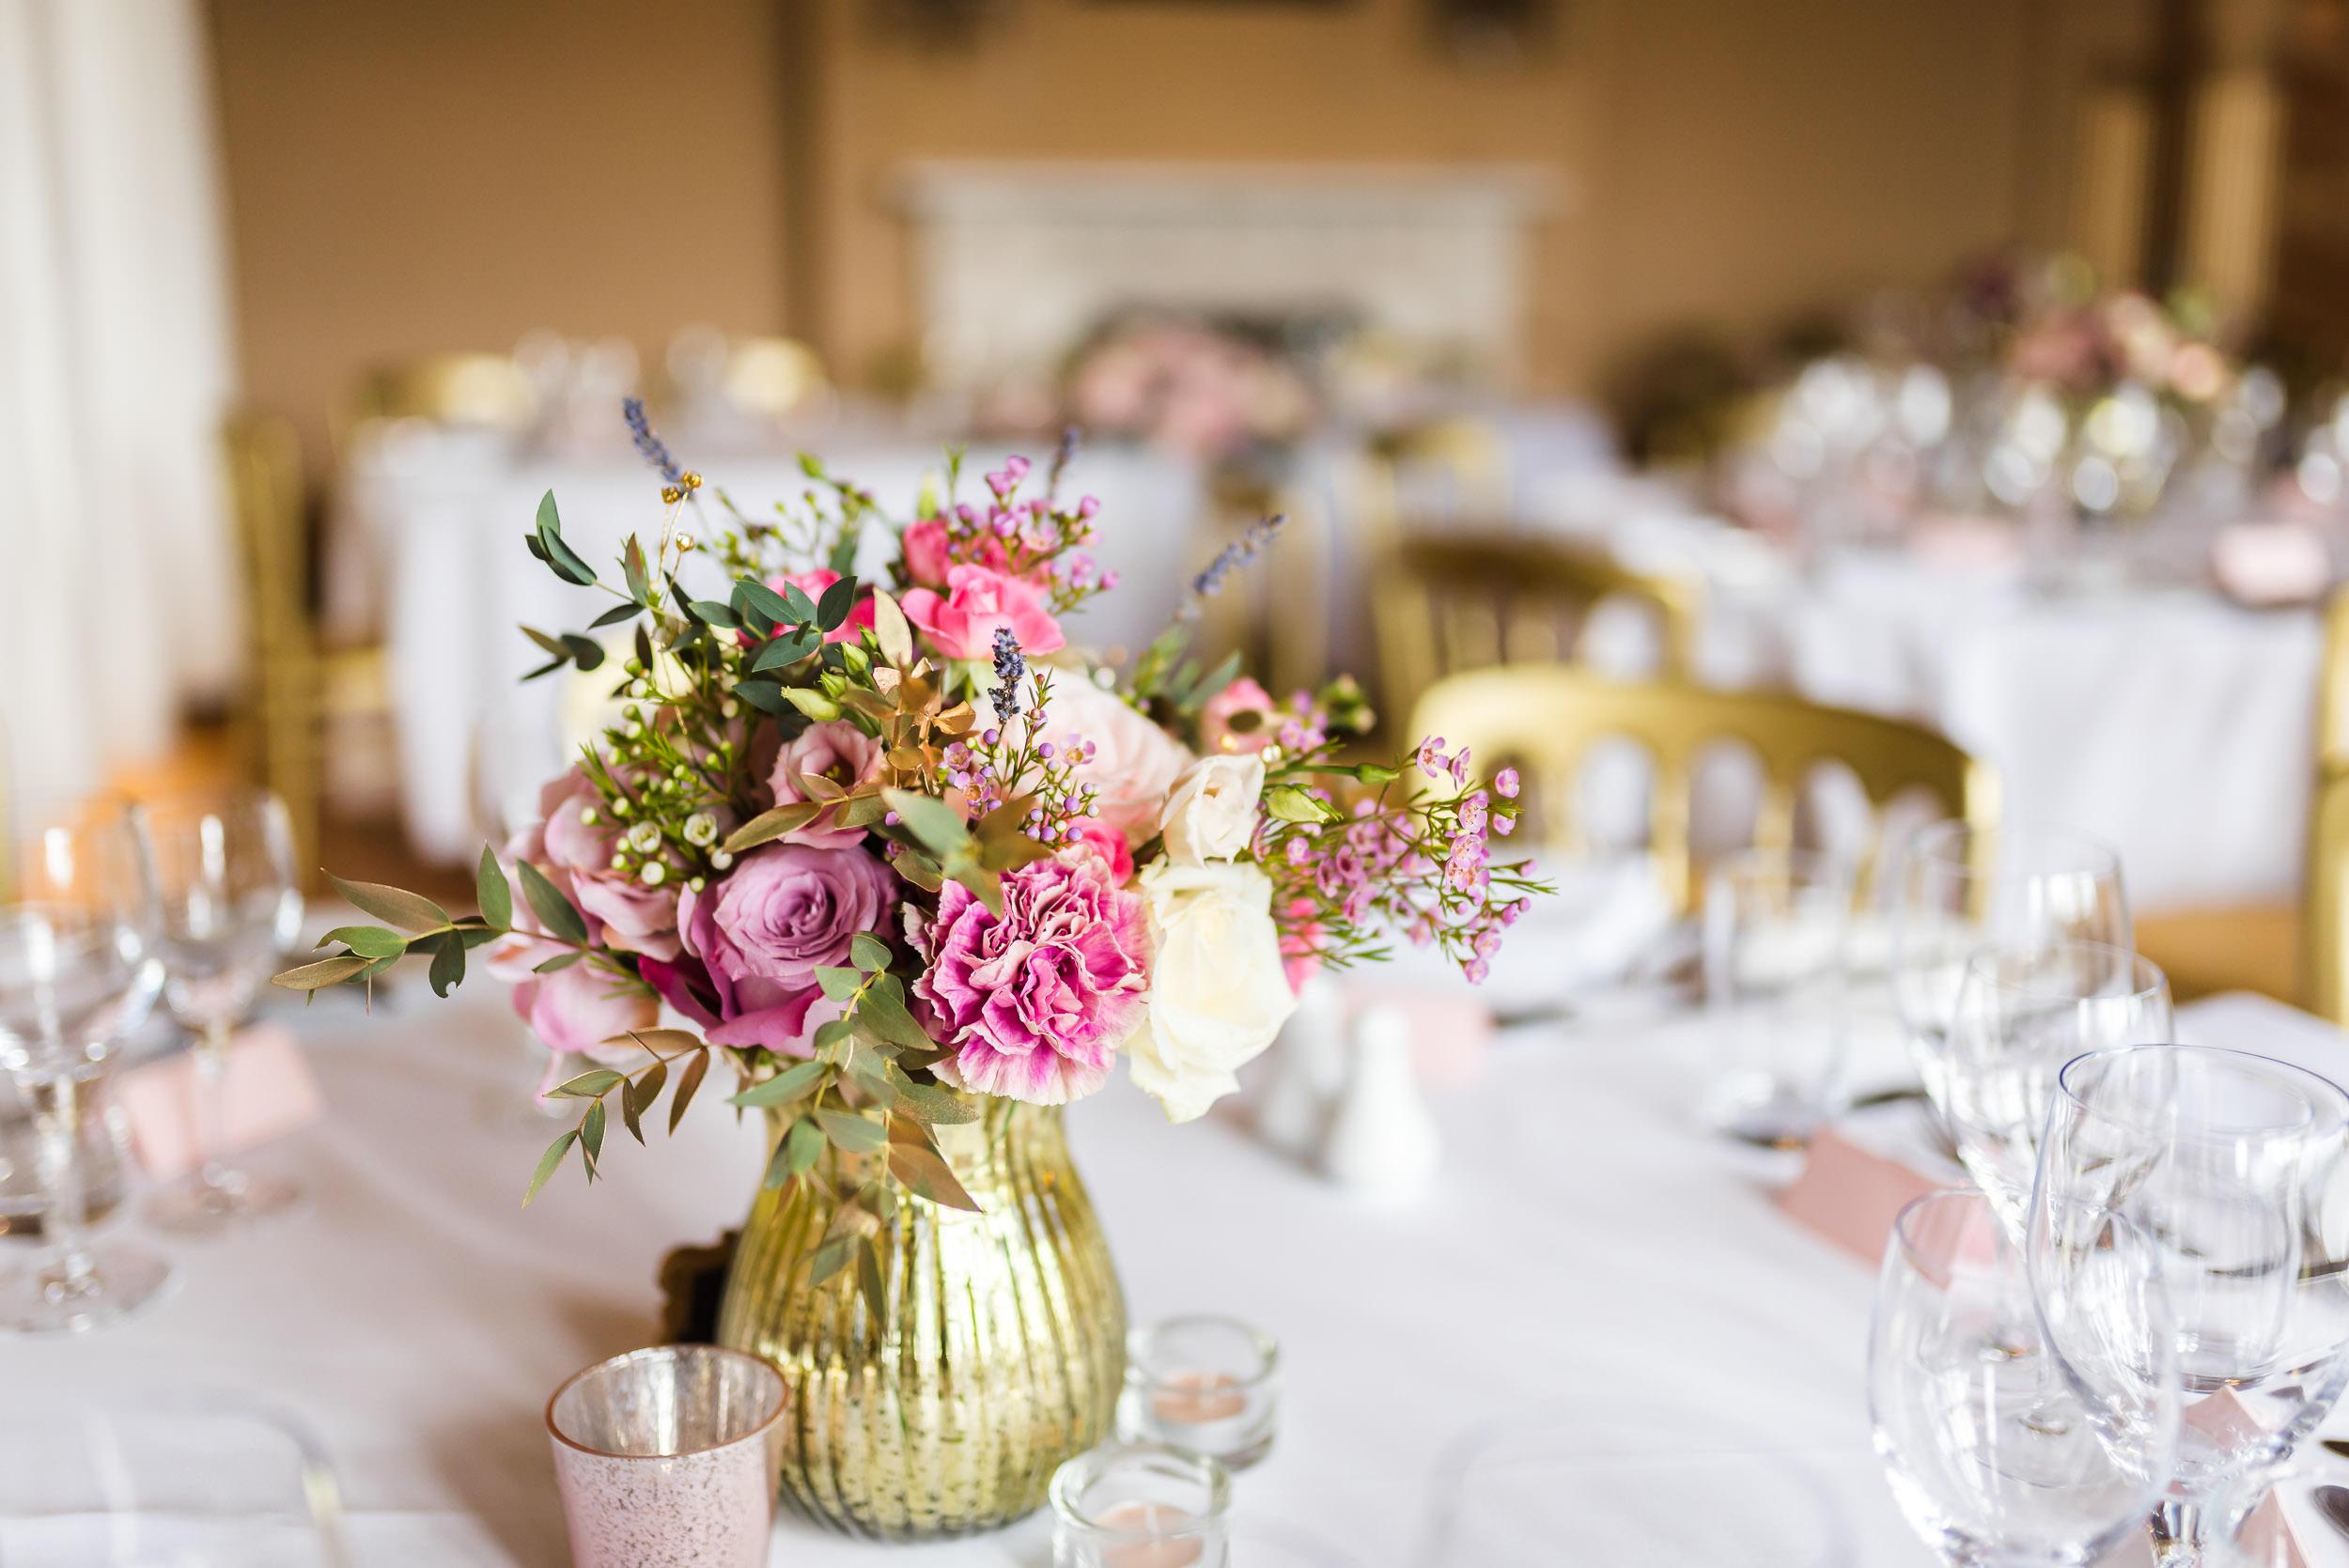 NC-20170909-2017-09-09_livvy-and-alice-wedding-0557.jpg